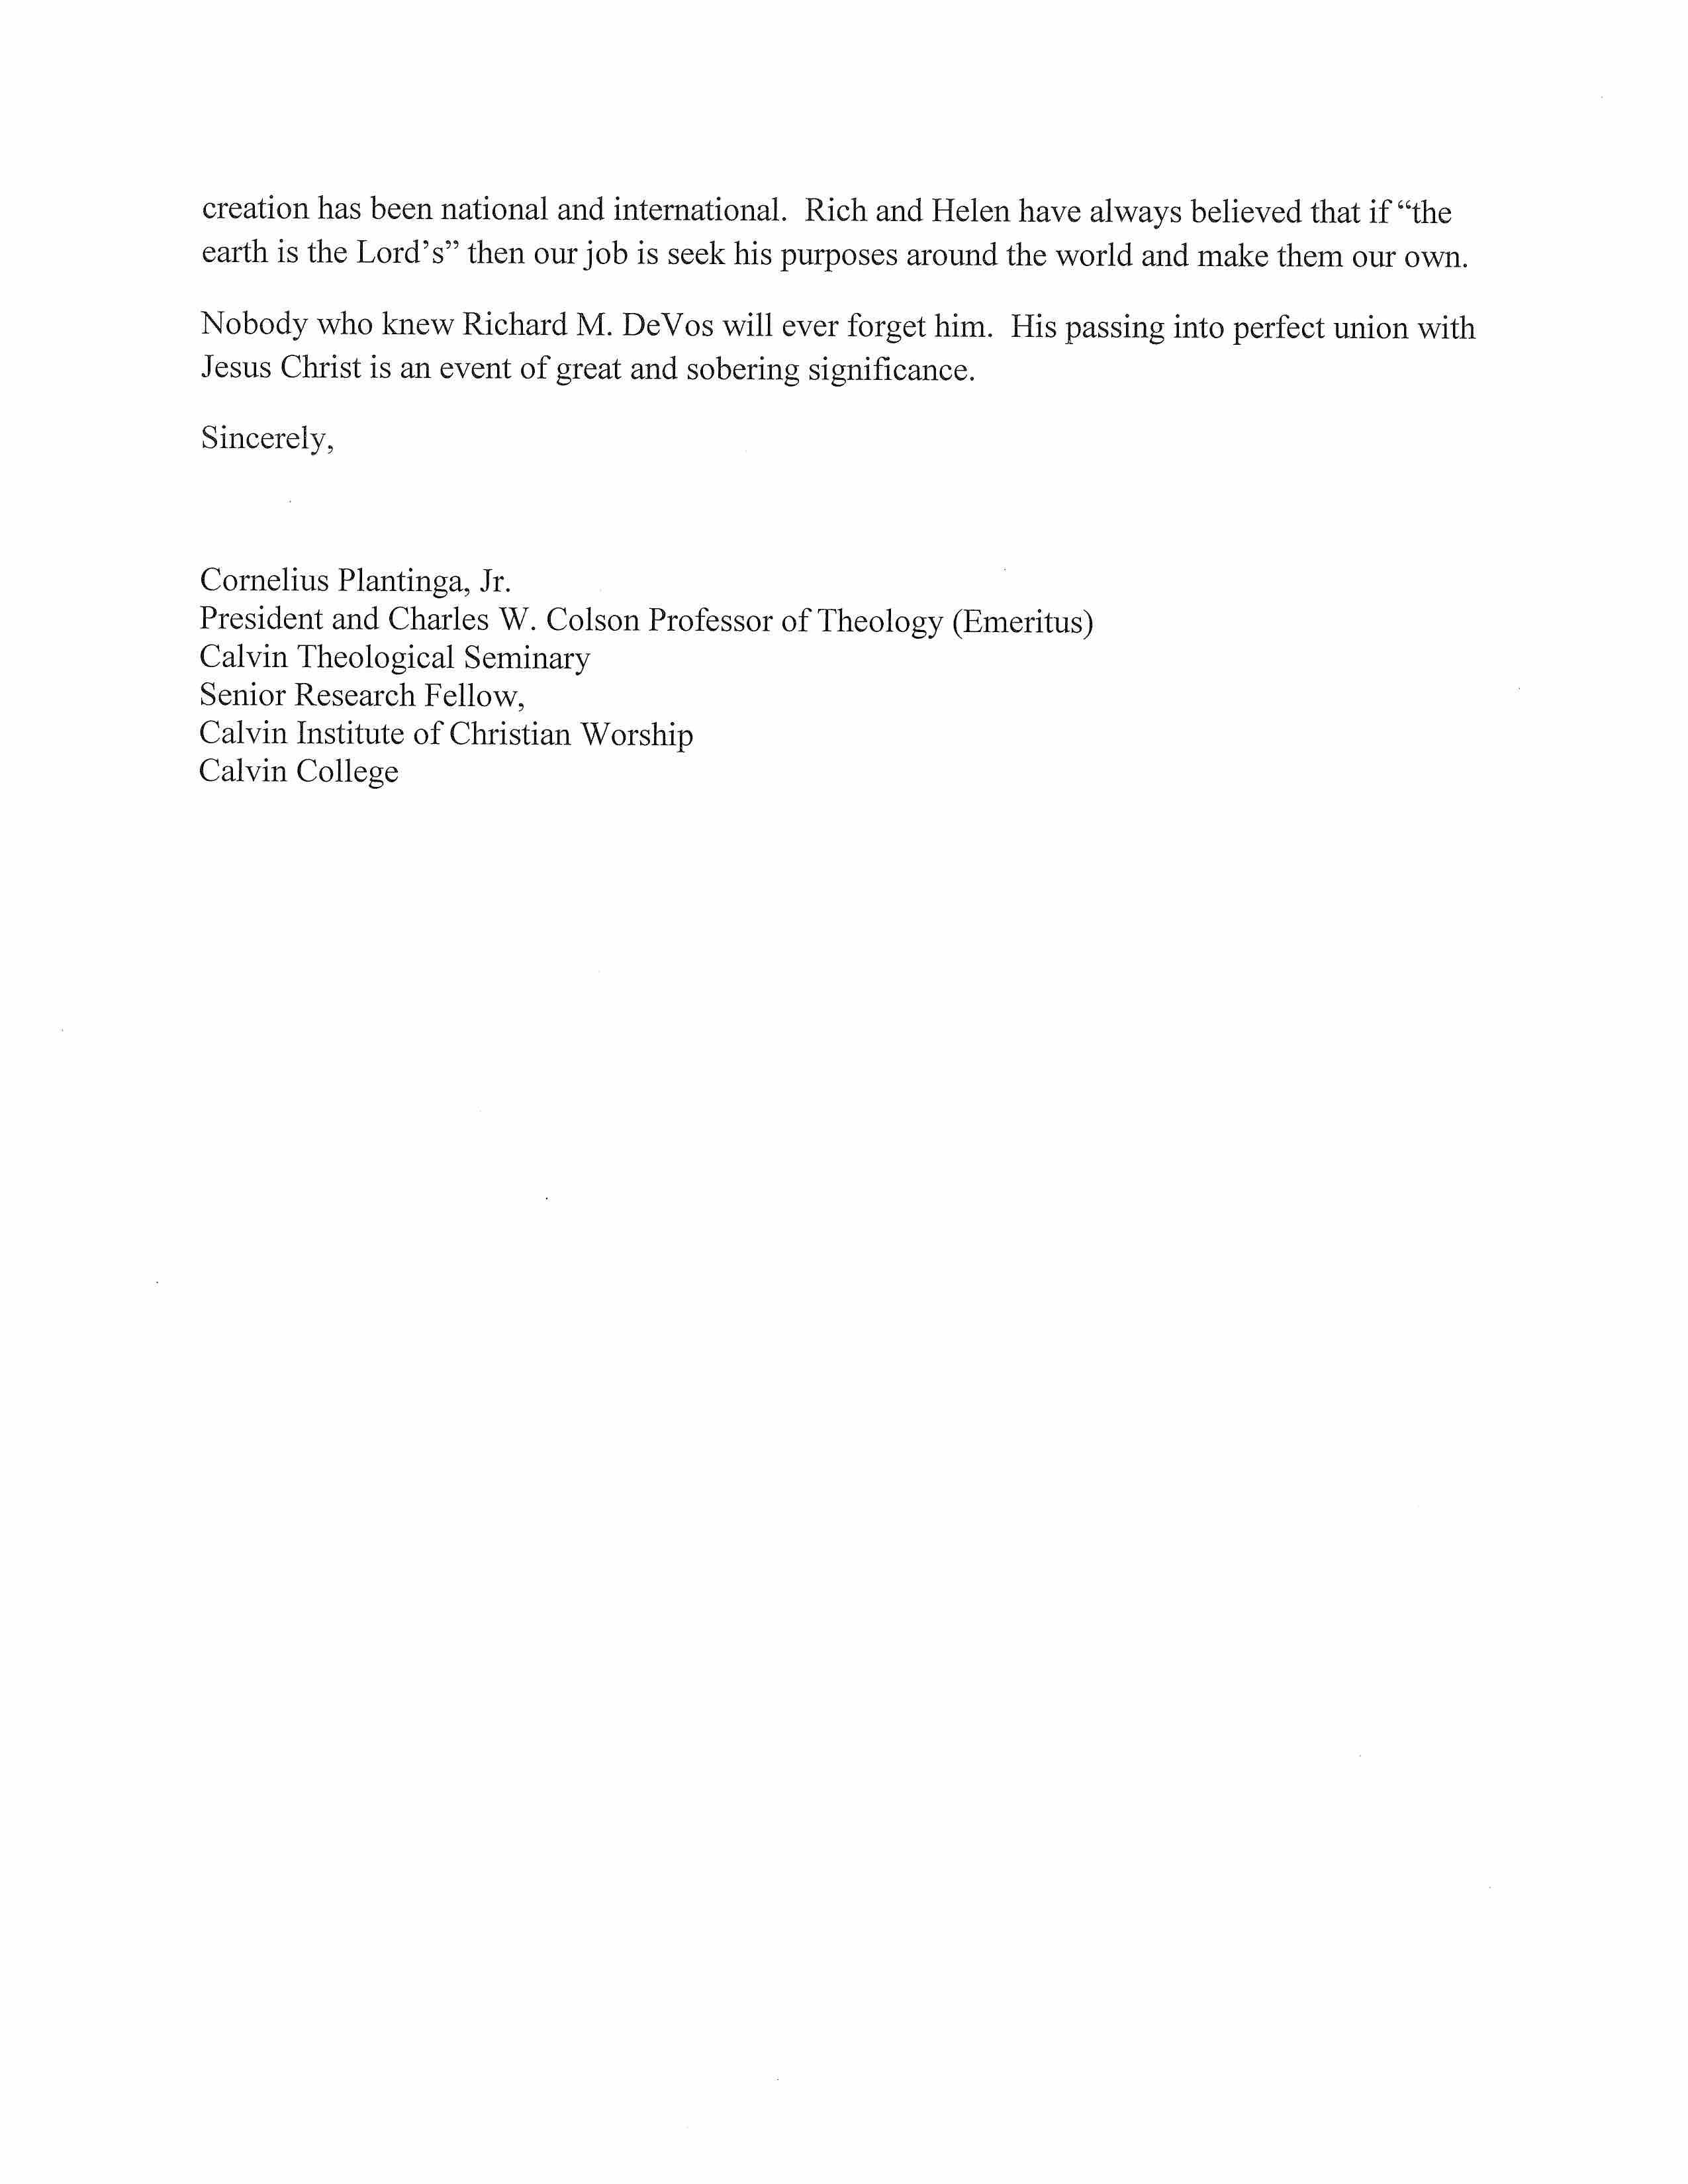 Letter From Cornelius Plantinga, Jr.